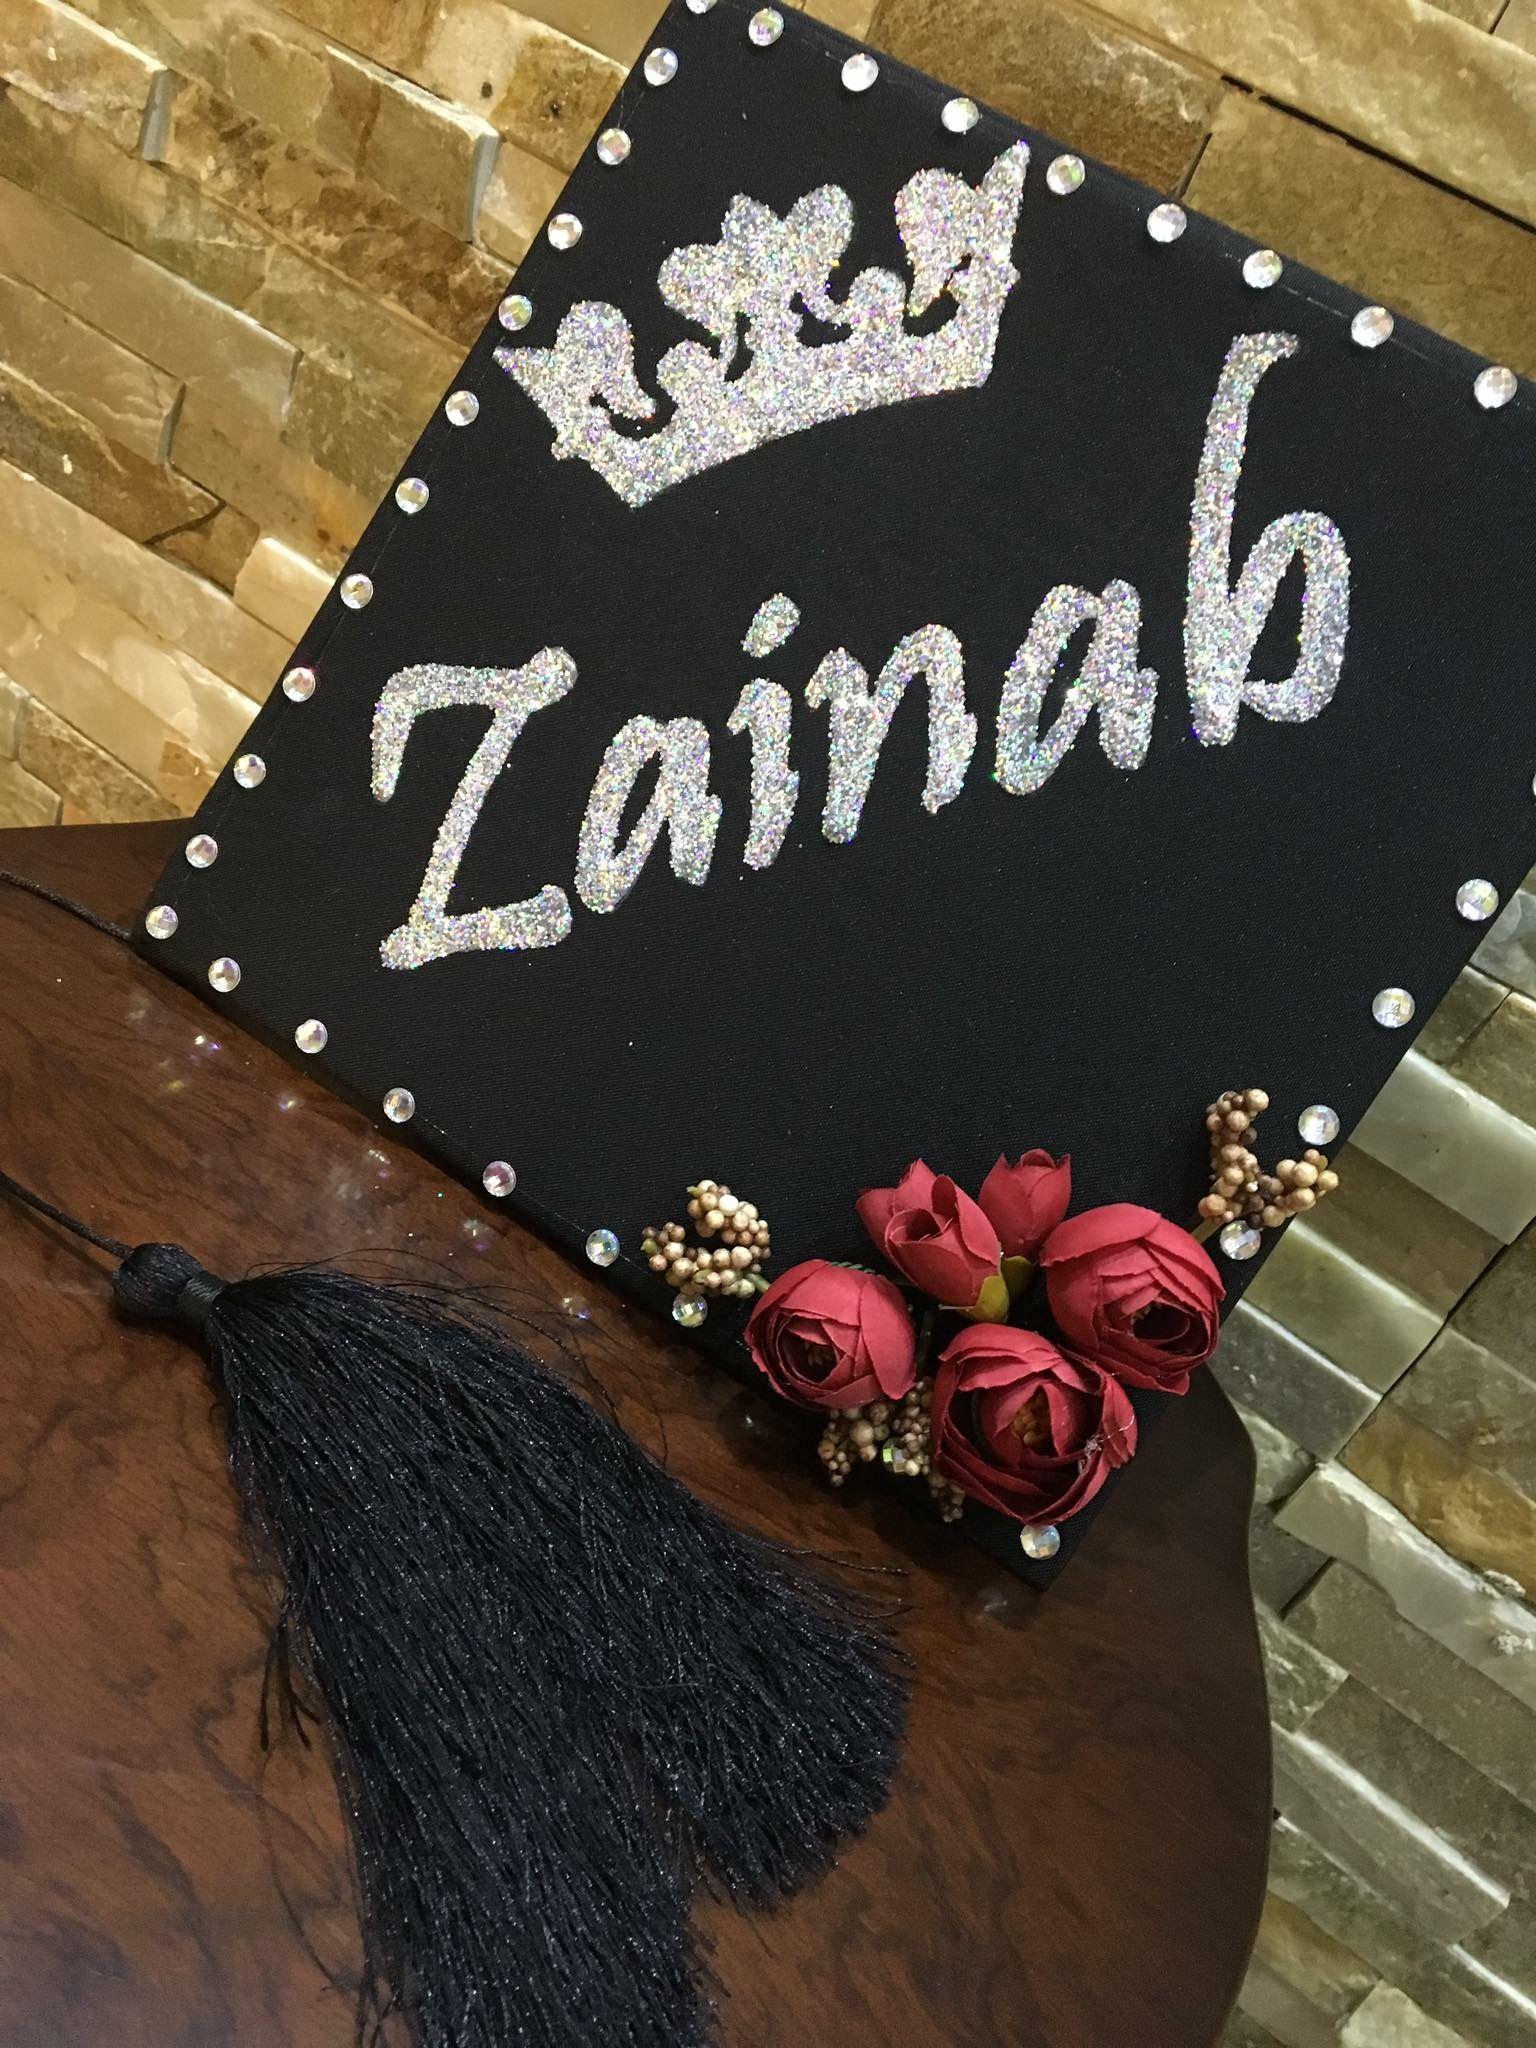 Pin By Zainab Basim On قبعات تخرج Tableware Deco